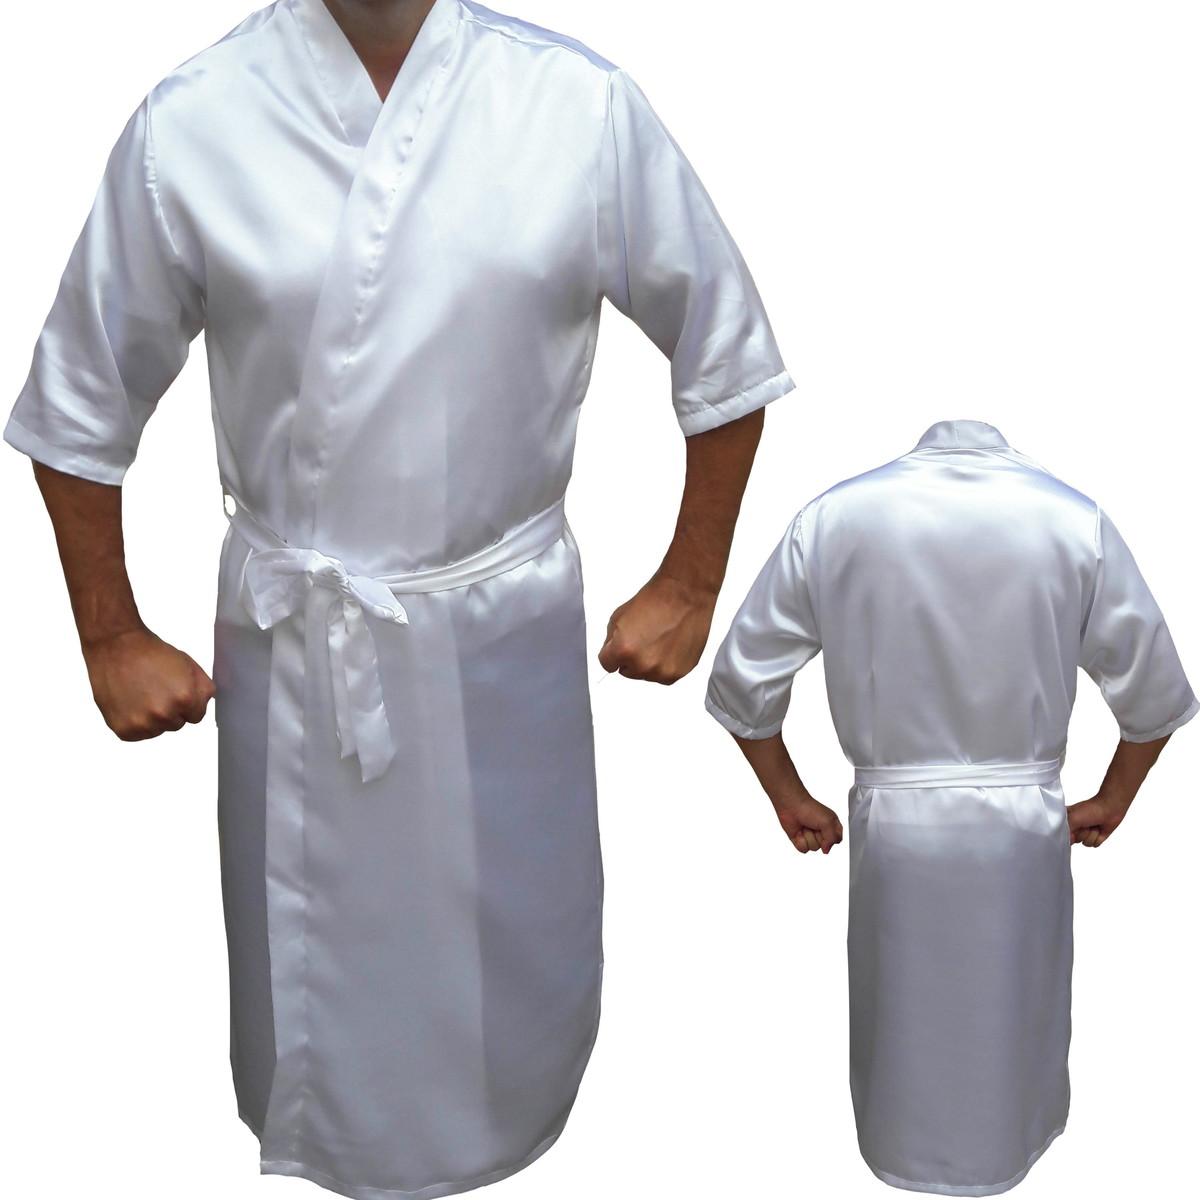 b21edf13c80fa9 Robe Cetim Roupão Masculino Manga 3/4 Noivo Casamento Branco